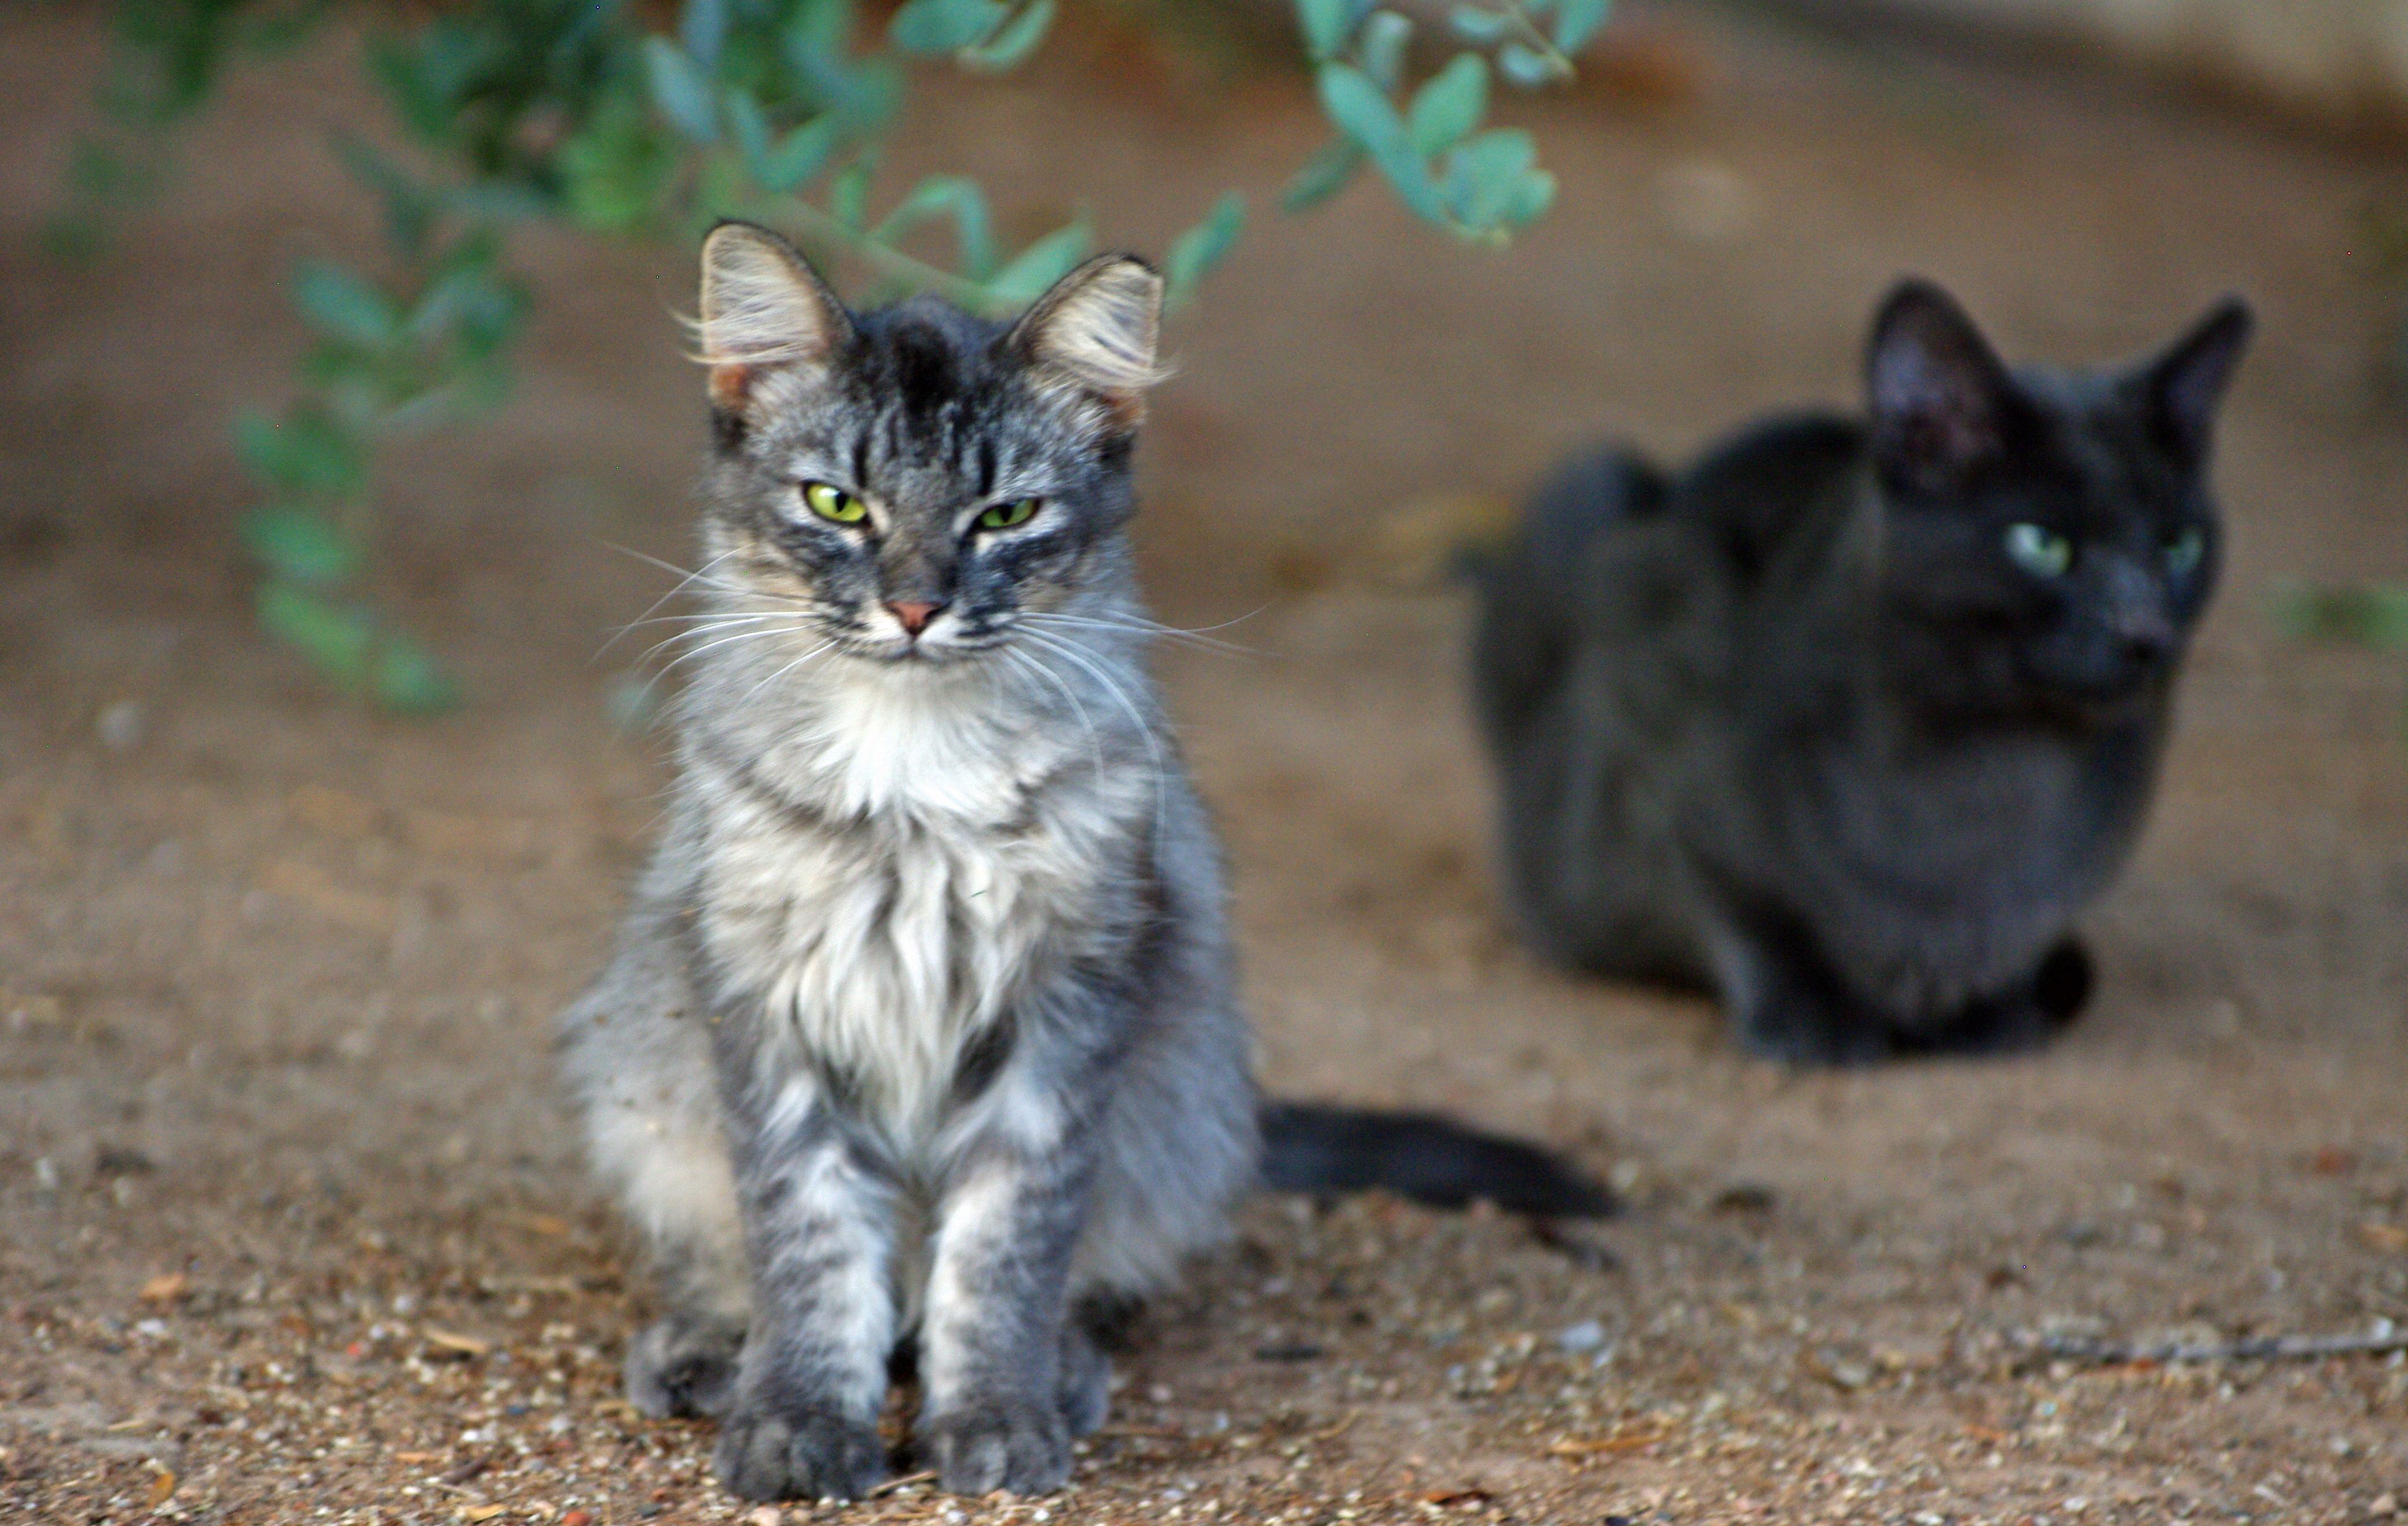 https://www.adlaz.org/wp-content/uploads/2016/03/Phx-cats-cropped-1-1.jpg